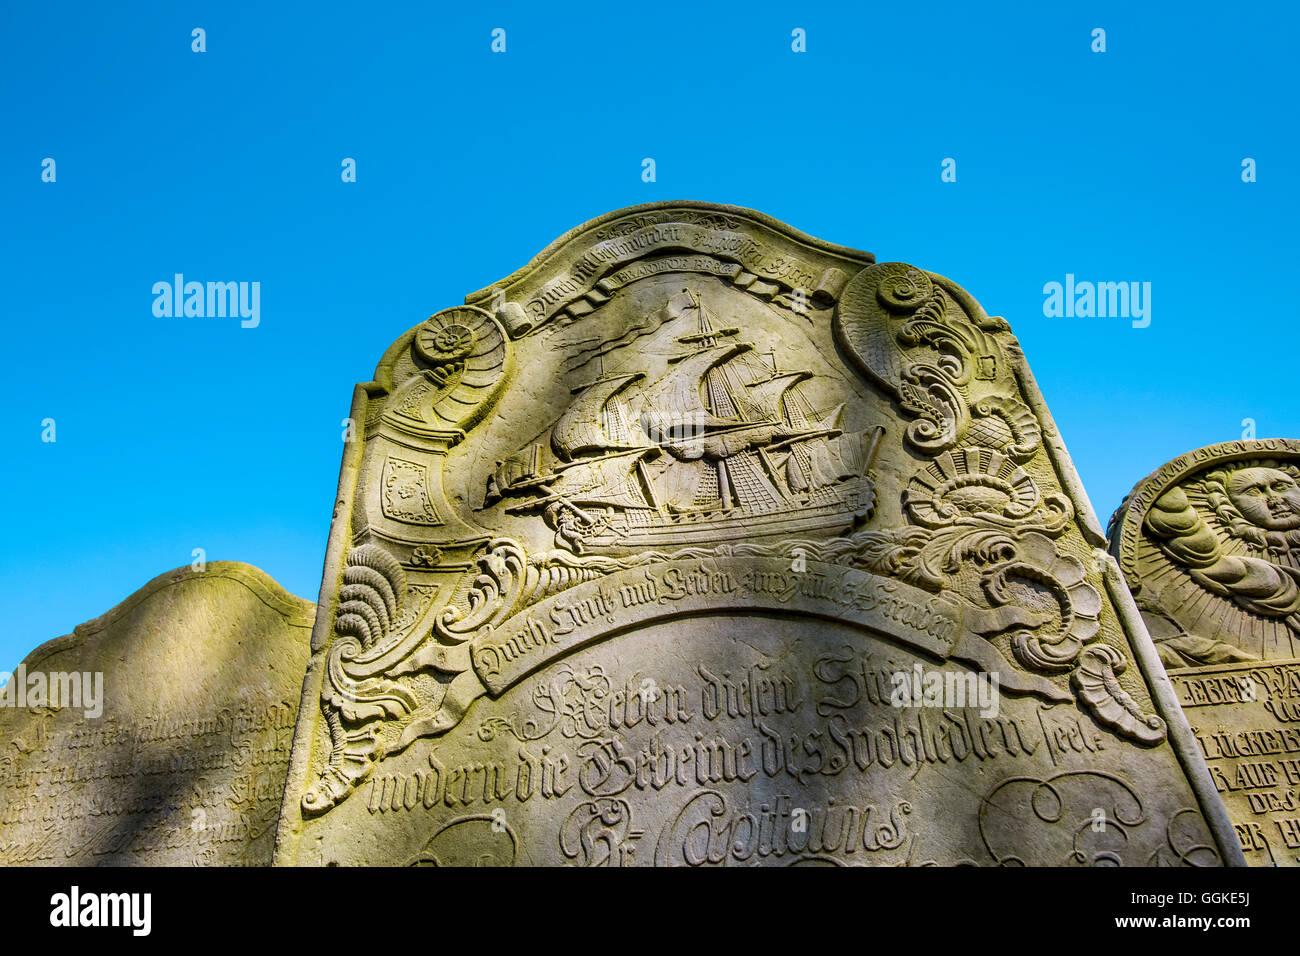 Seamens gravestone, cemetery, Nebel, Amrum Island, North Frisian Islands, Schleswig-Holstein, Germany - Stock Image